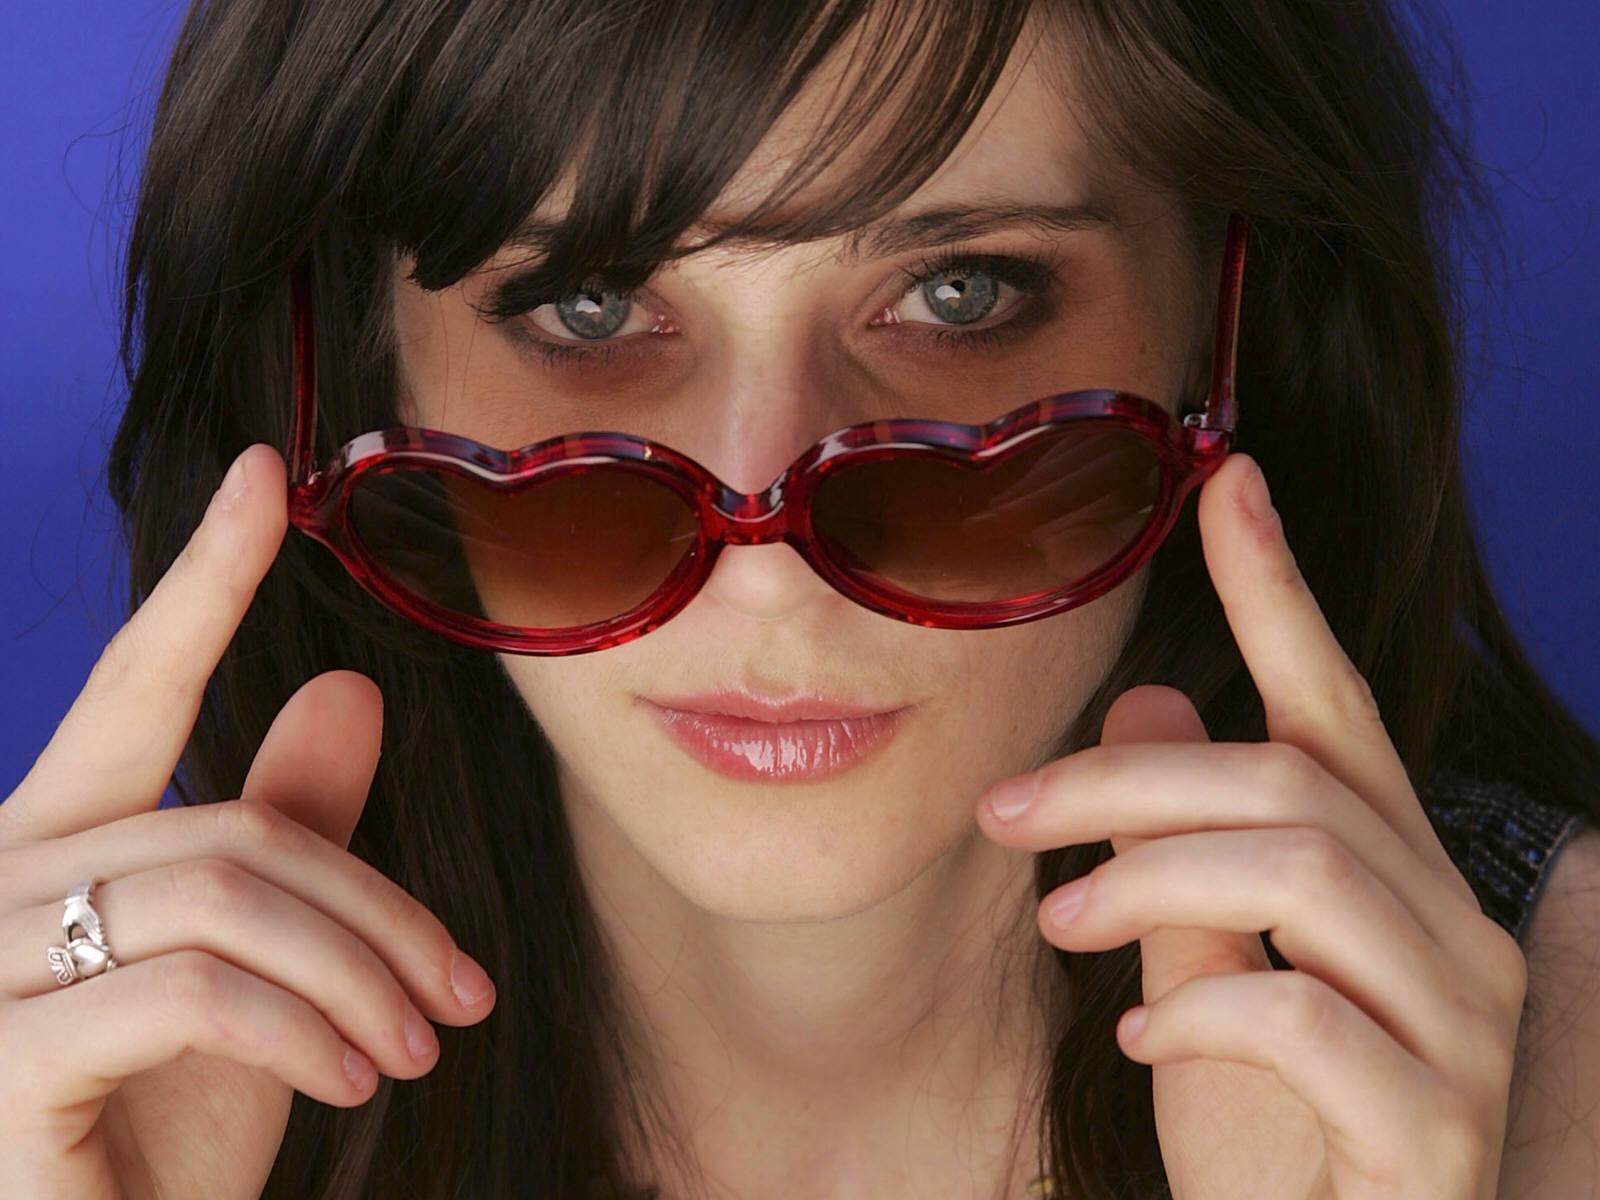 http://1.bp.blogspot.com/-XtSusd-Vyq0/TbDKjj59sKI/AAAAAAAAABA/nqZKCtD6JAU/s1600/zooey_deschanel_glasses_desktop_wallpaper_87670.jpg